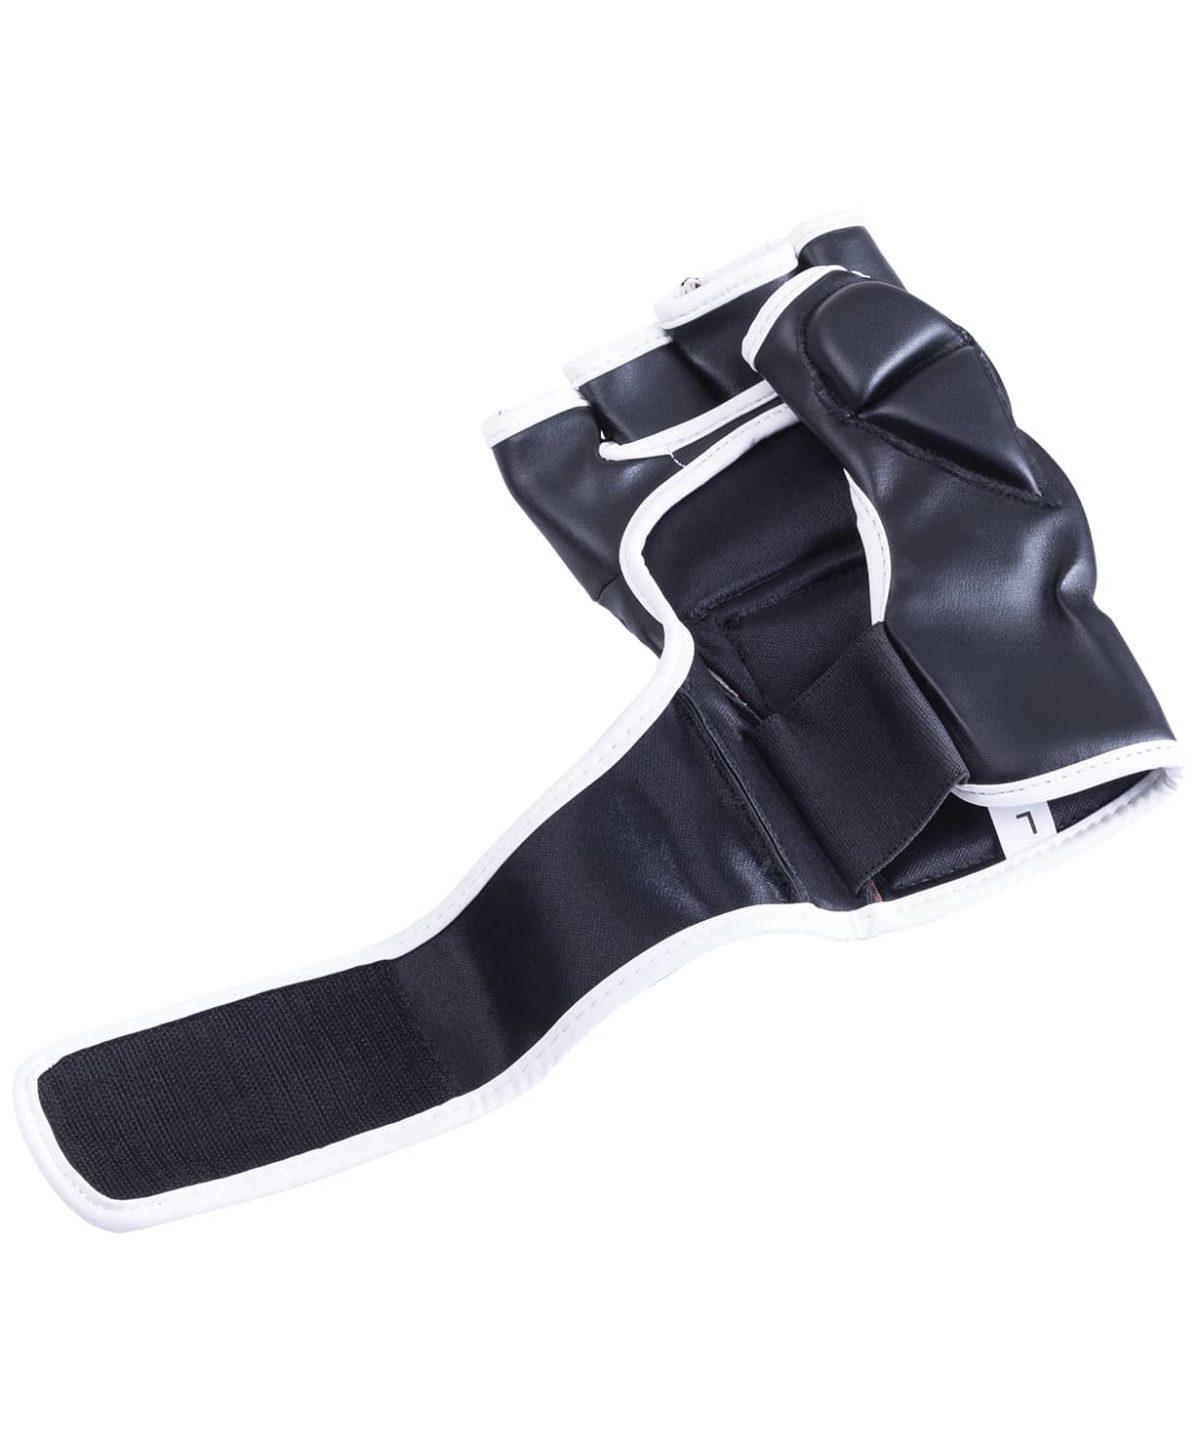 KSA Перчатки для ММА Wasp Black, к/з  7845 - 3